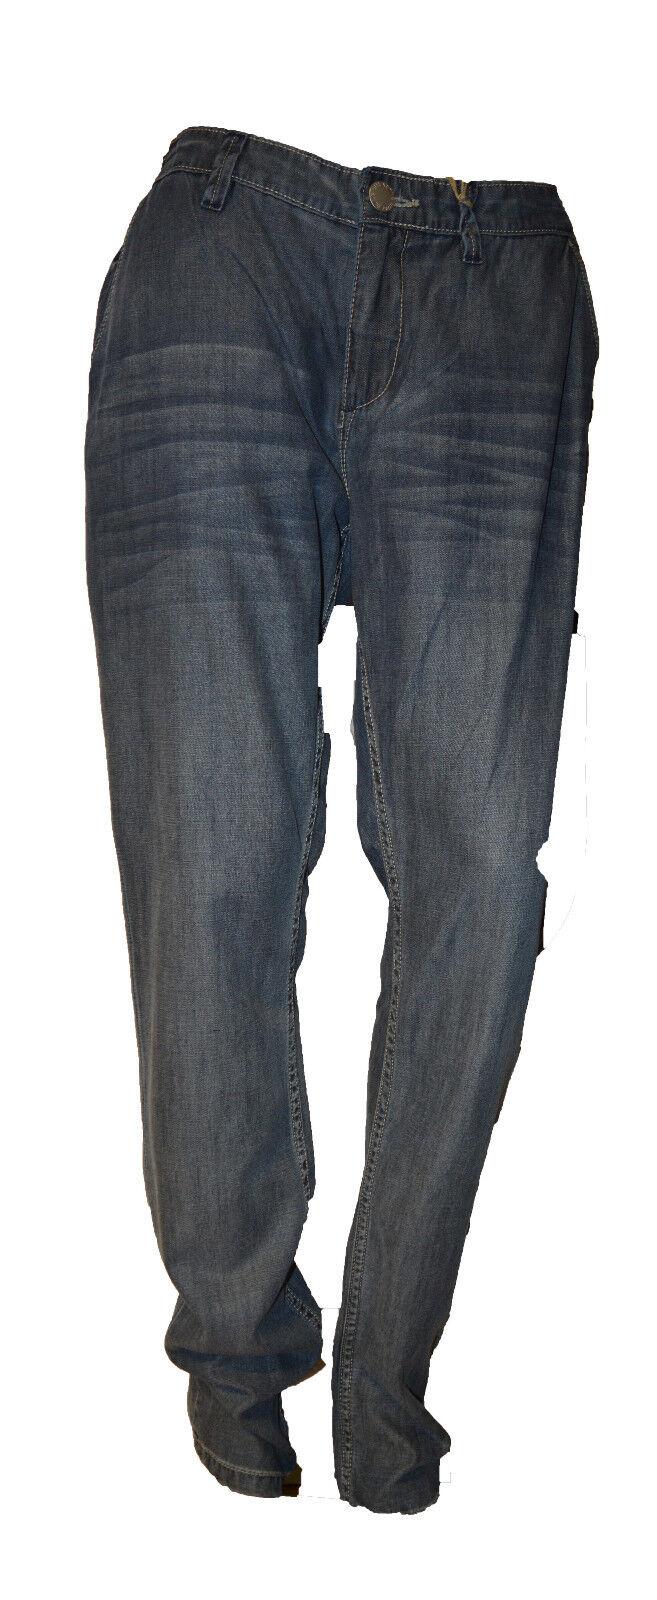 Billabong Jeans für Frauen China Deco Denim bleached Gr. 29 NEU